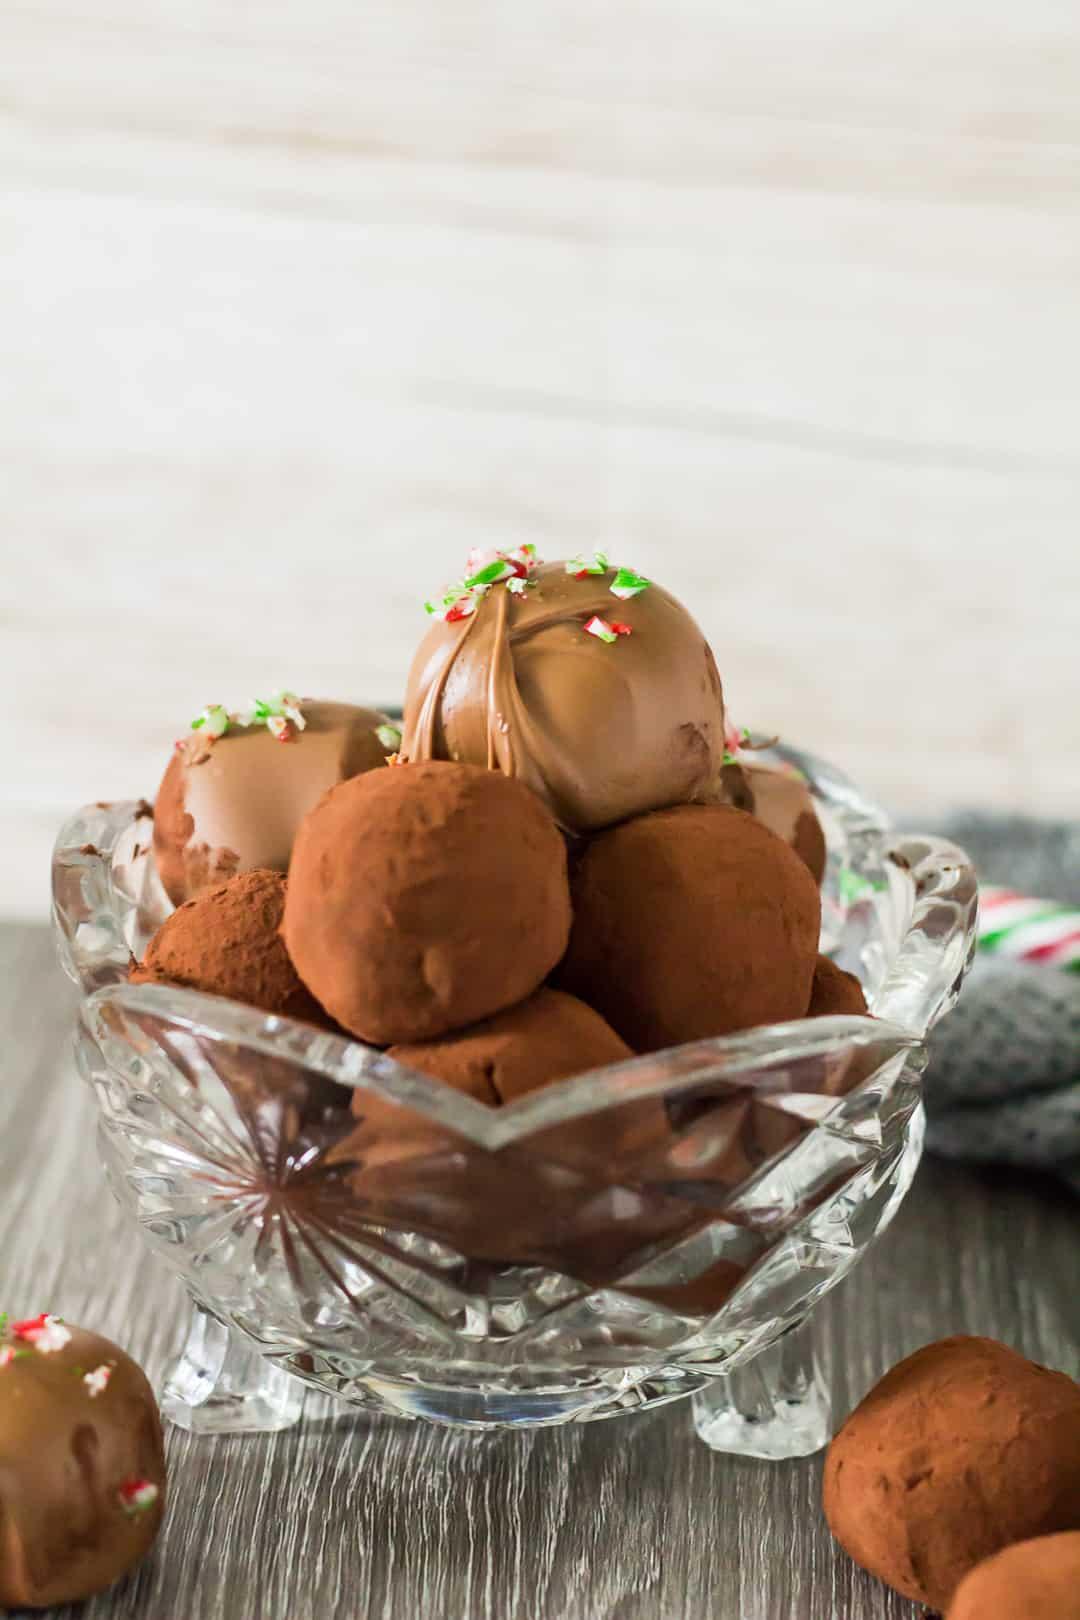 Peppermint Chocolate Truffles